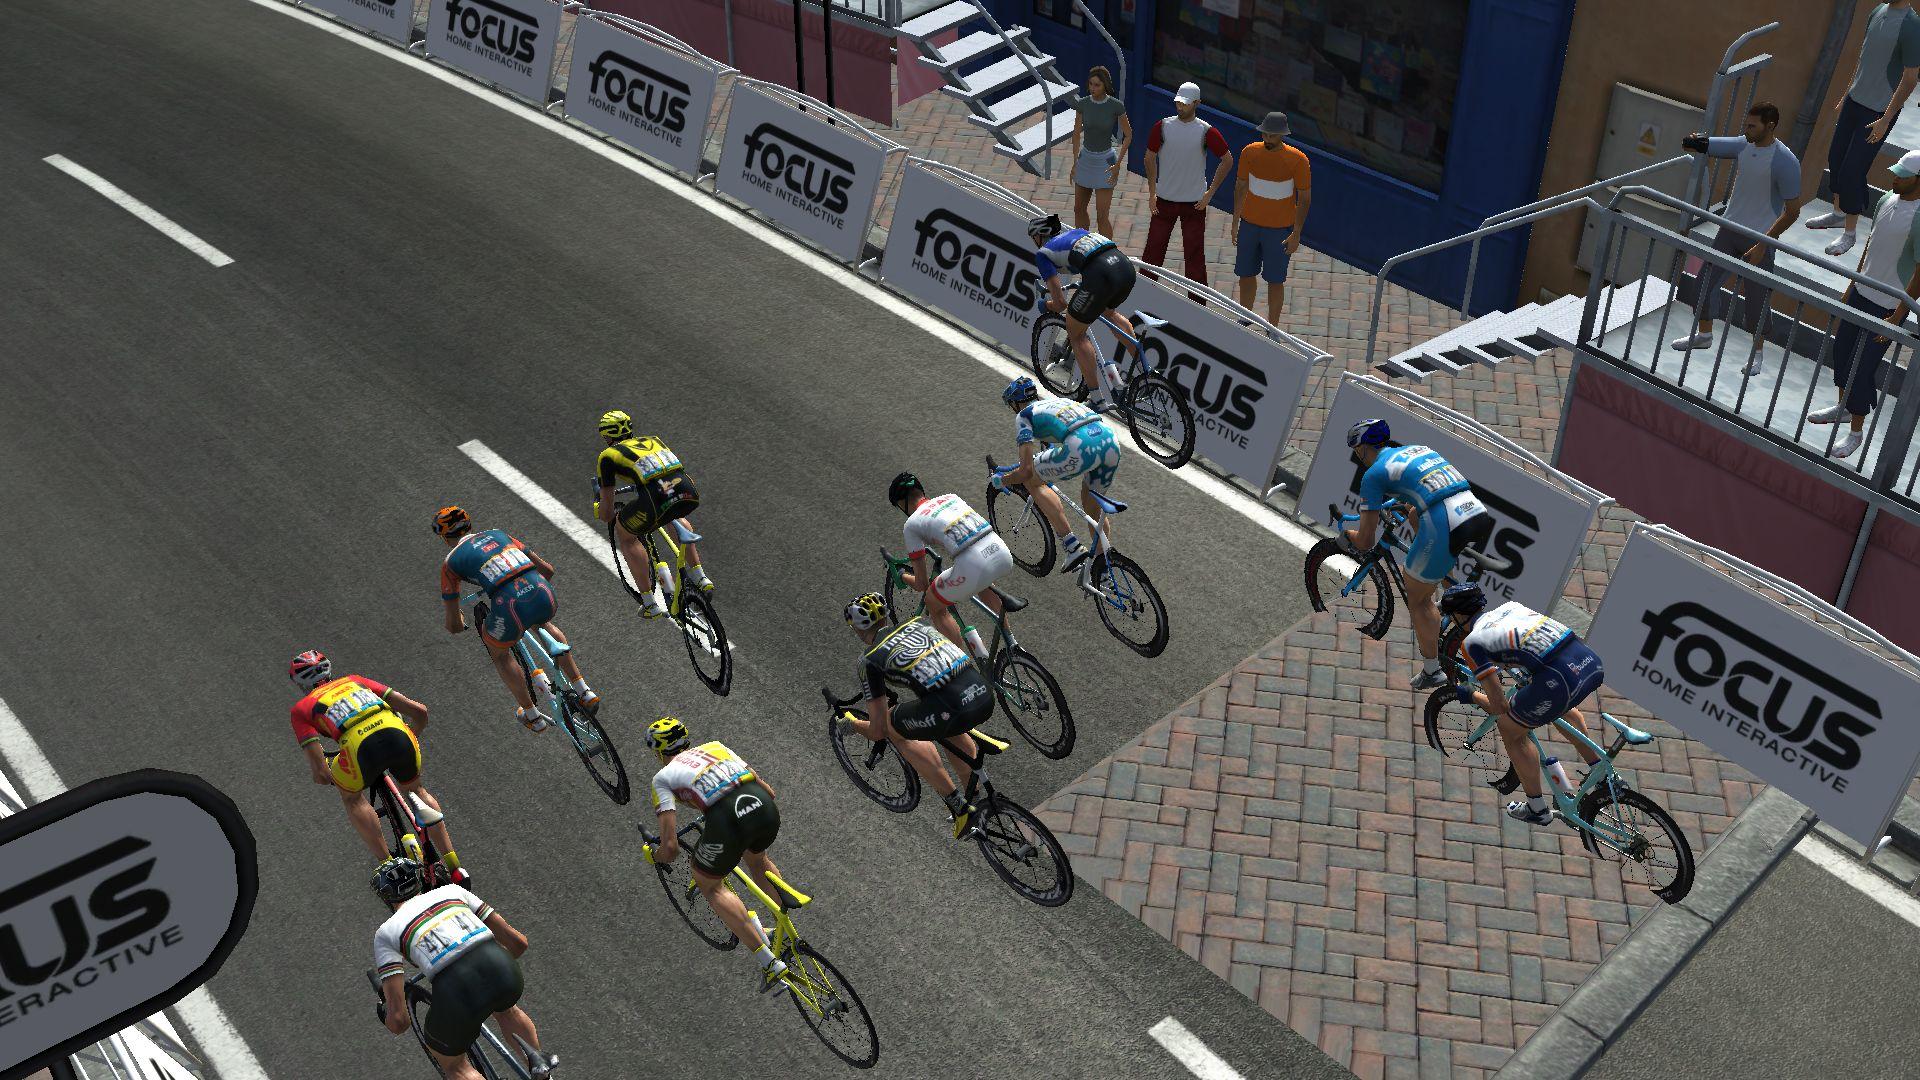 pcmdaily.com/images/mg/2019/Races/GTM/Giro/mg19_giro_10_PCM0142.jpg